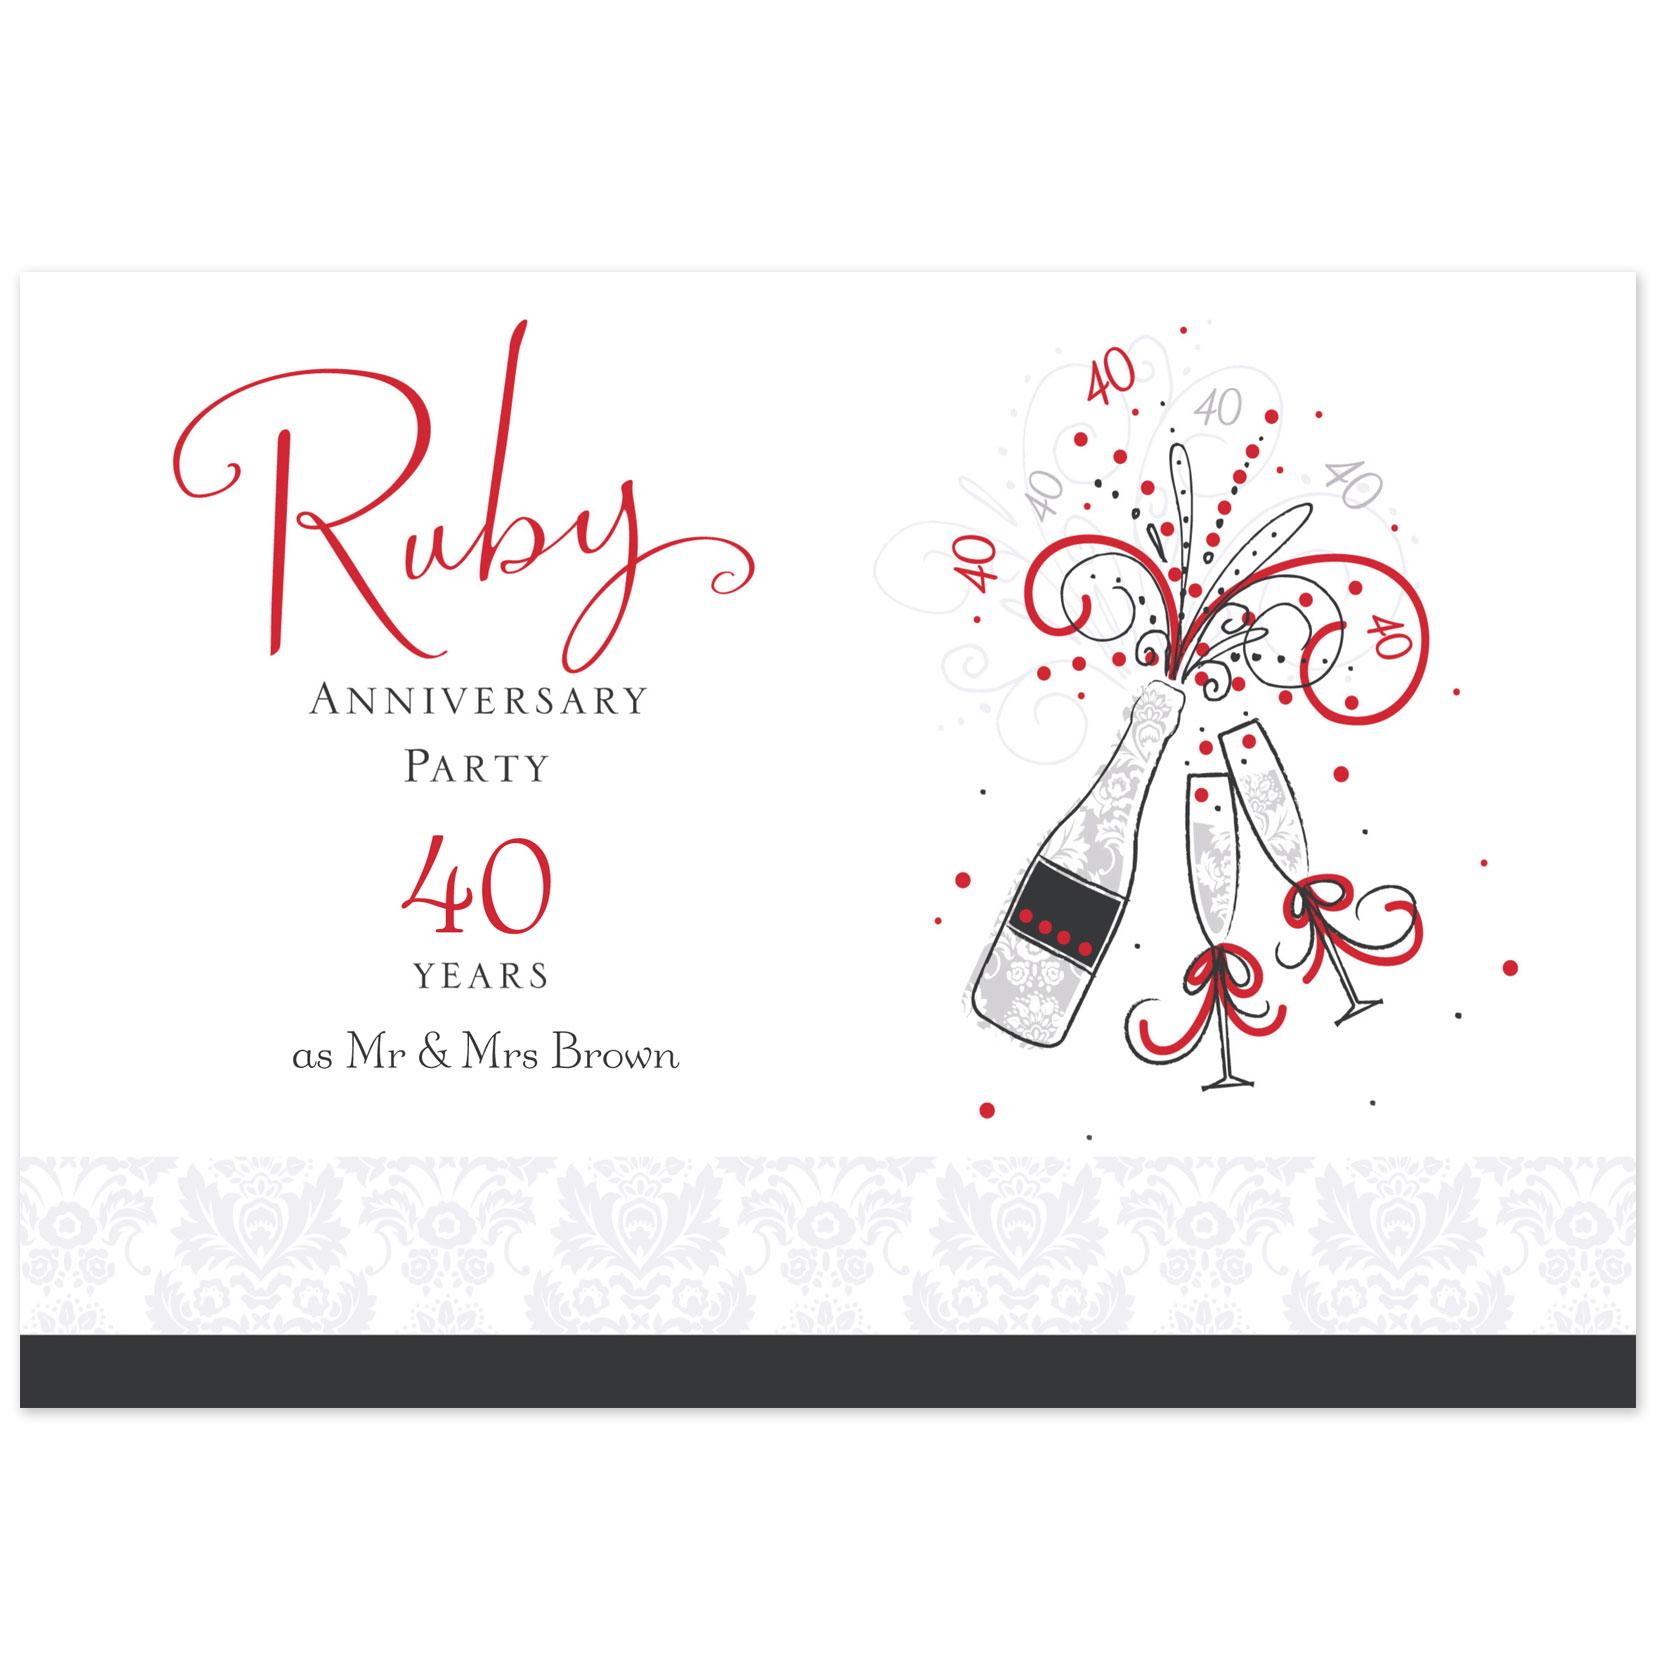 40th Wedding Anniversary Quotes: Hallmark Anniversary Quotes. QuotesGram